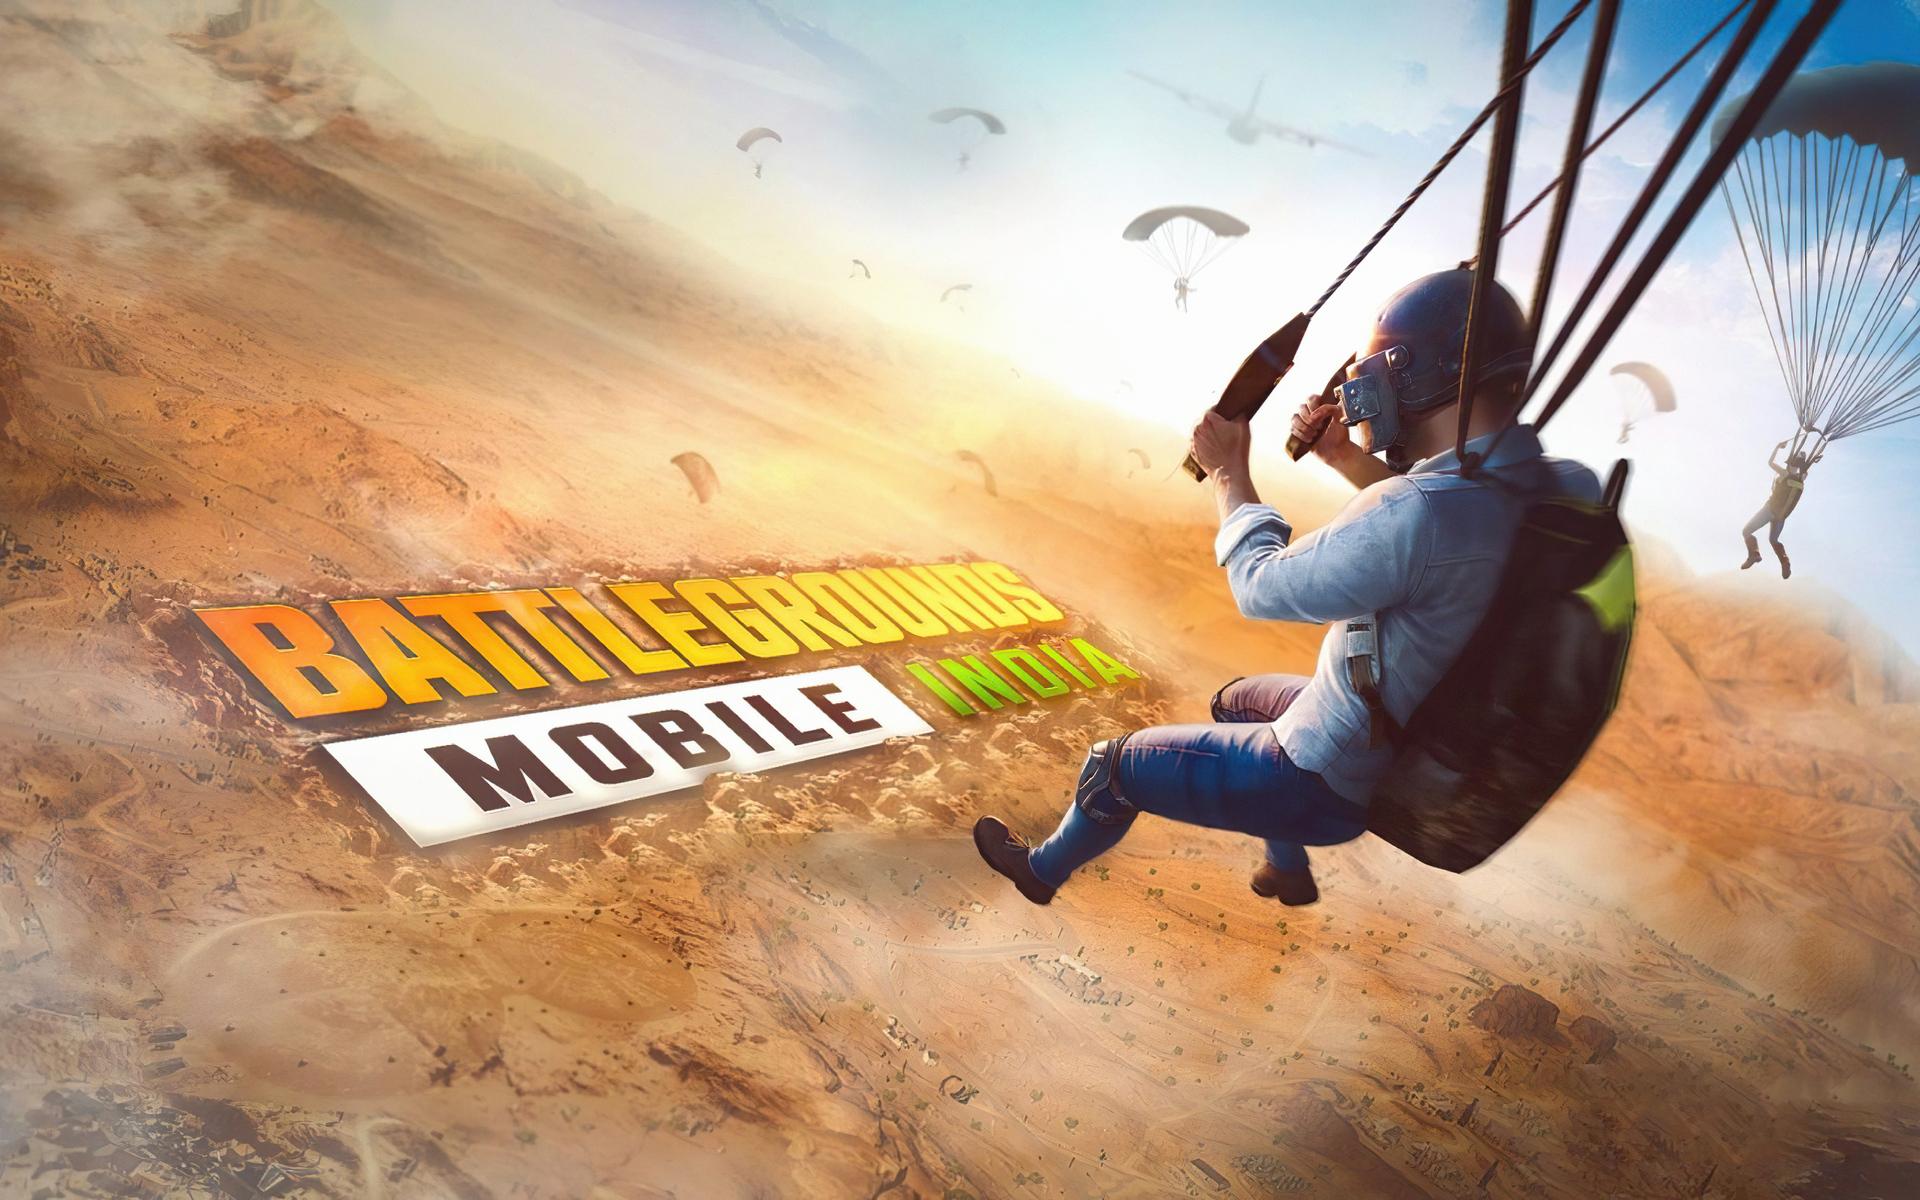 battlegrounds-mobile-india-gg.jpg